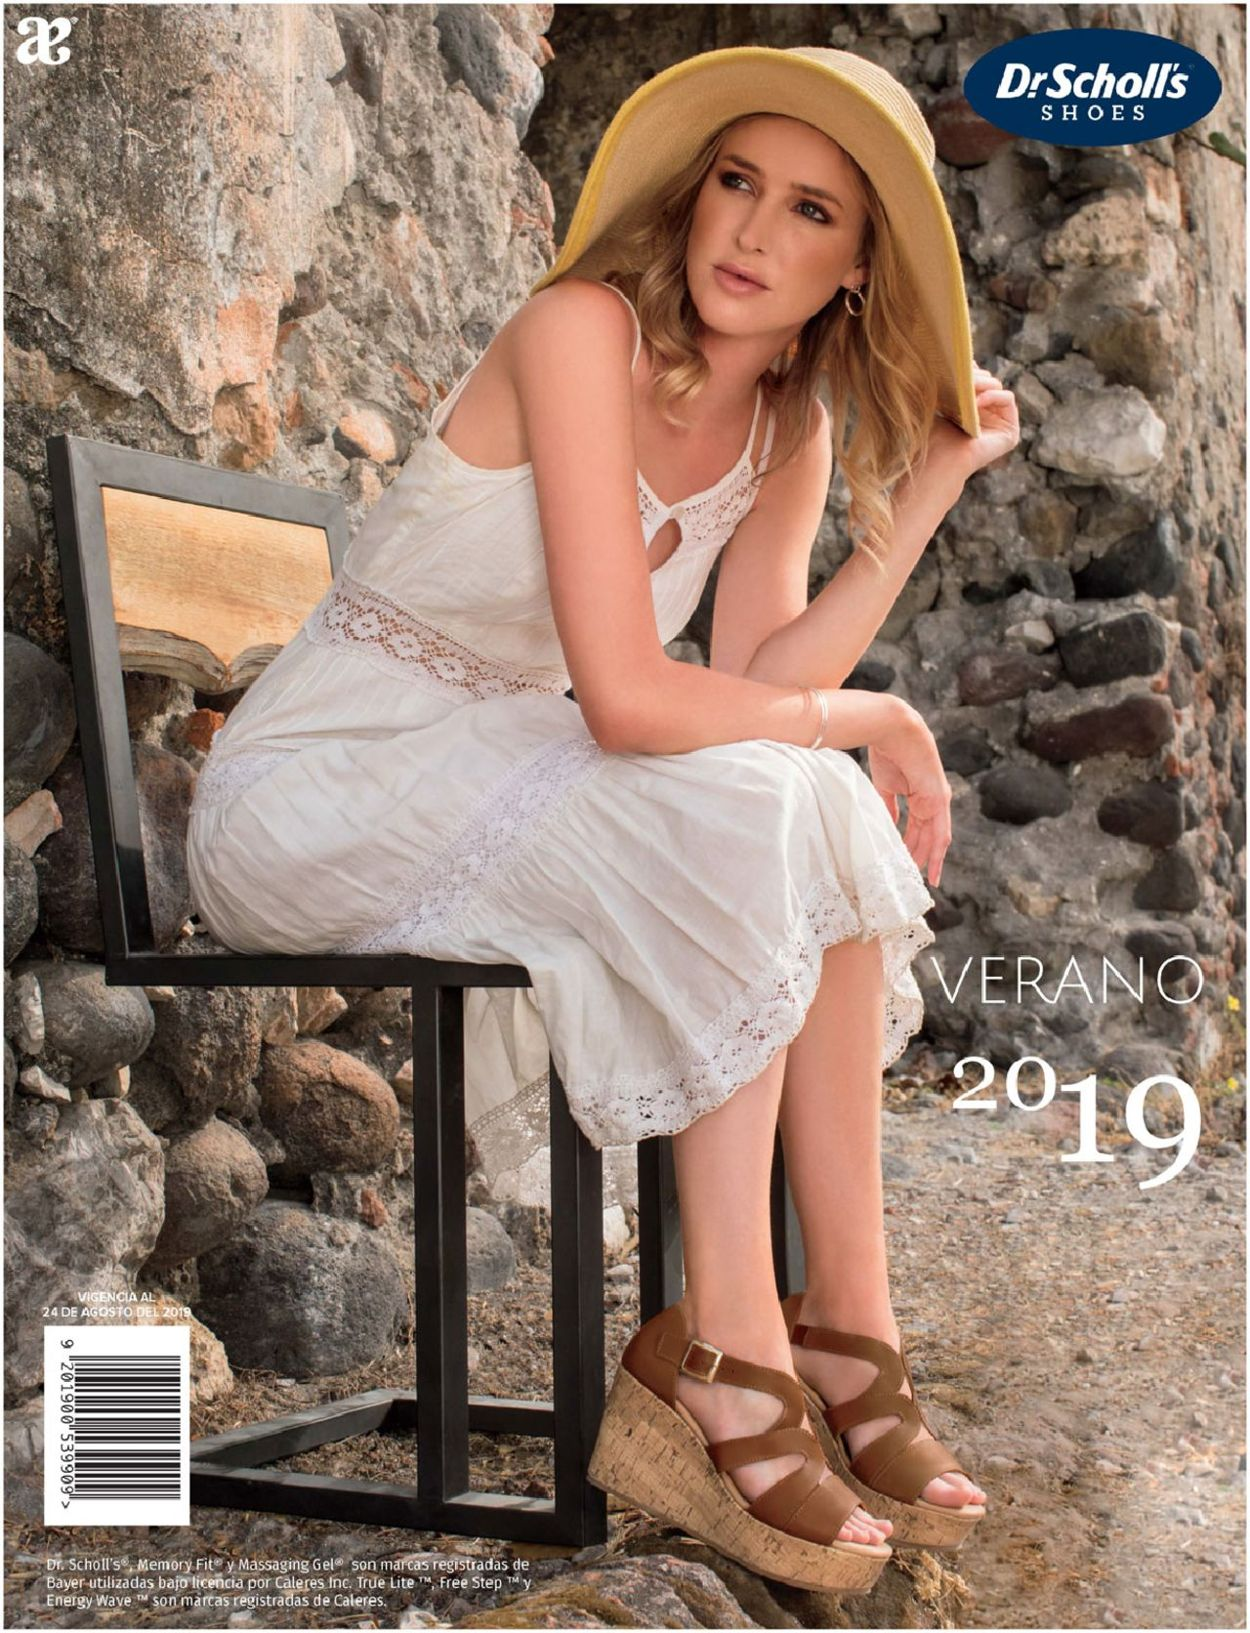 Andrea Folleto - 19.05-24.08.2019 (Página 19)